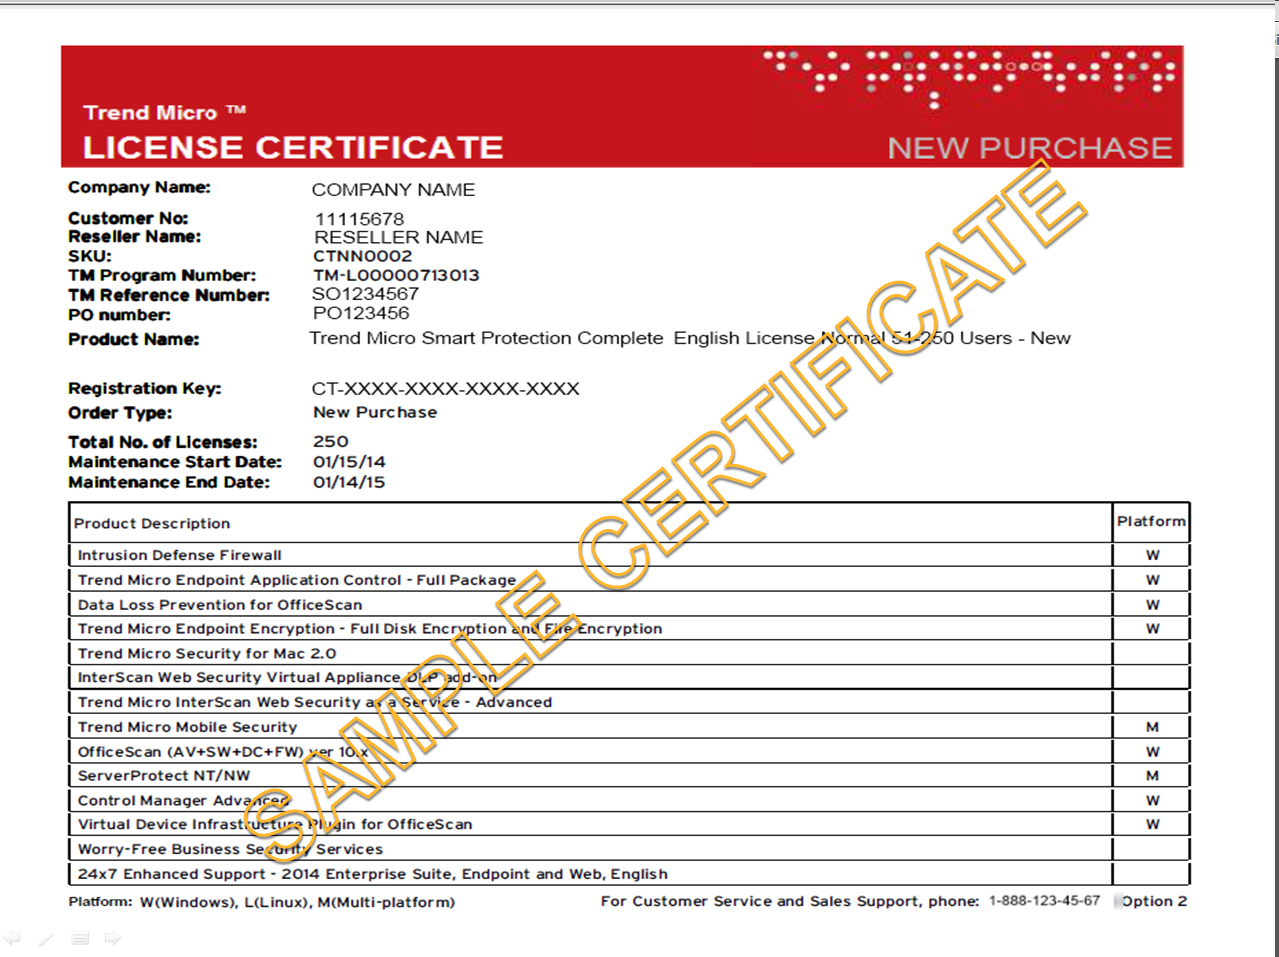 Sample license certificate